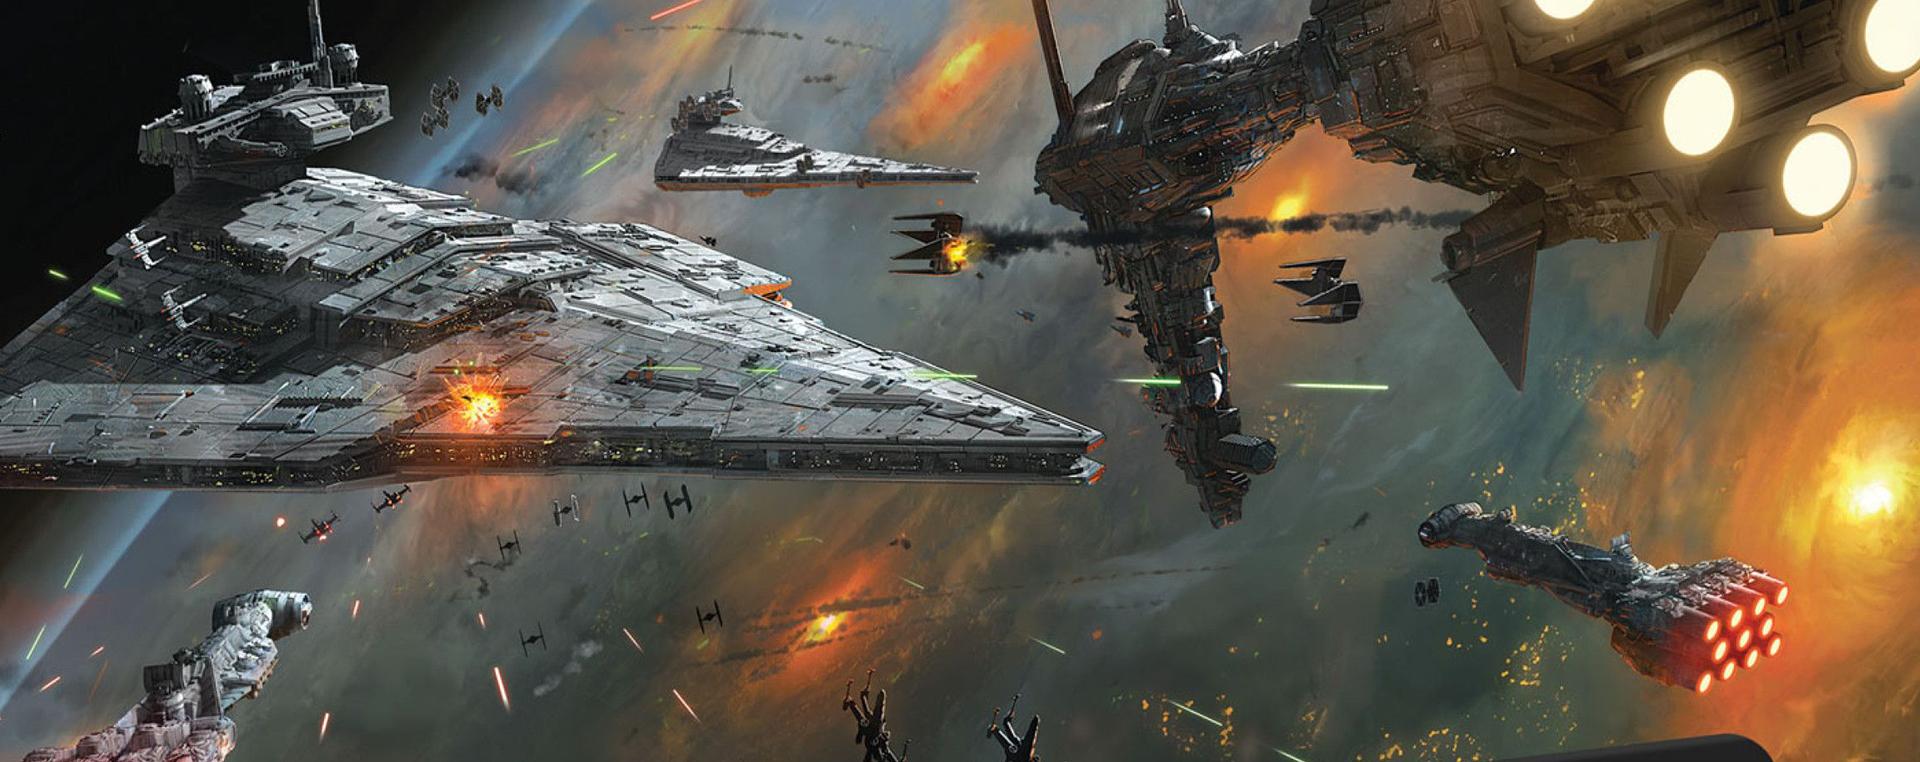 Star wars armada -